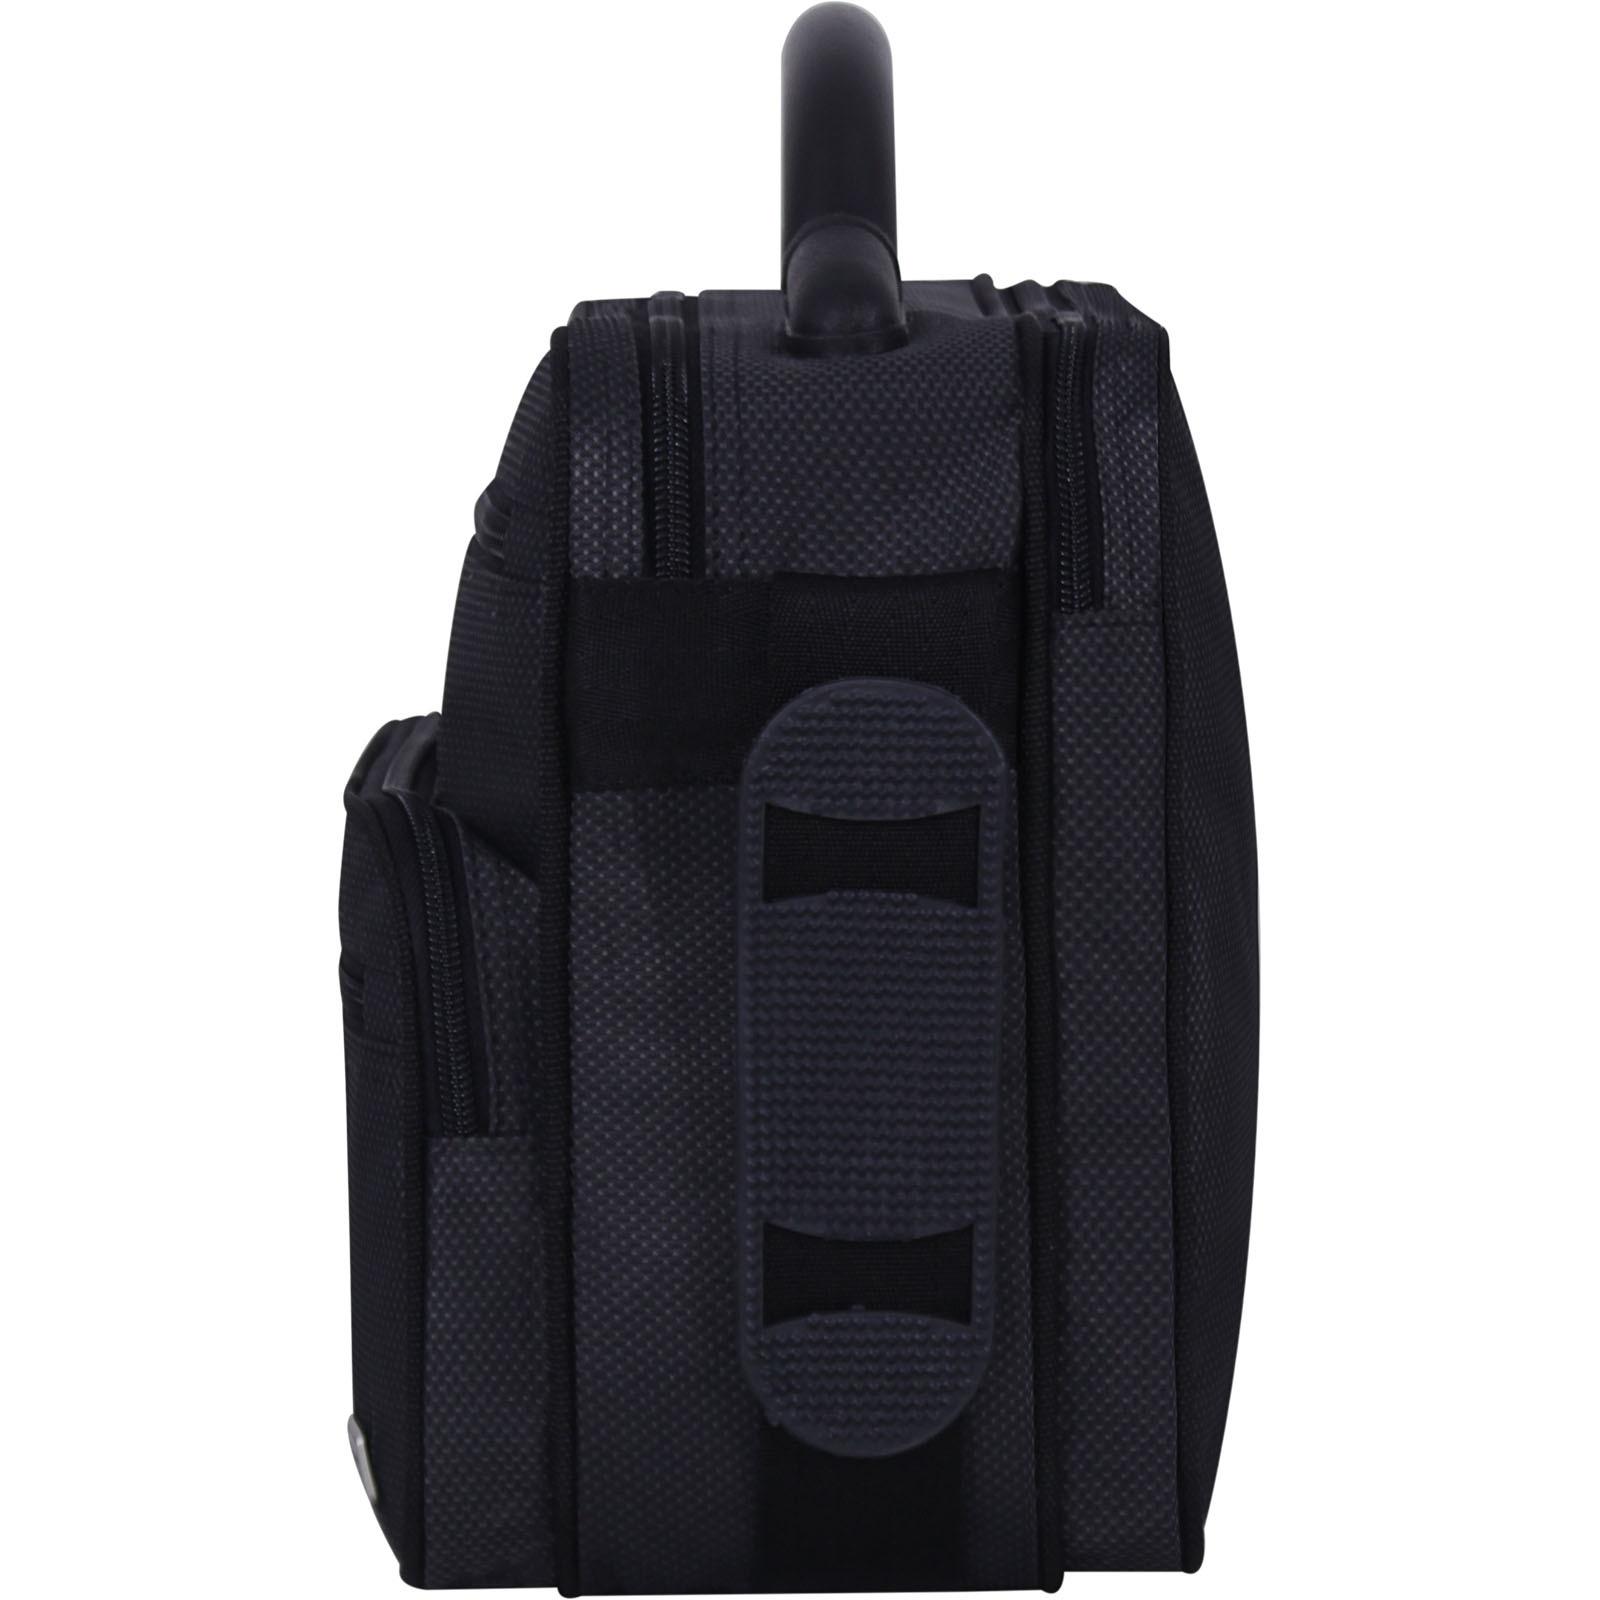 Мужская сумка Bagland Mr.Braun 8 л. Чёрный (00240169) фото 3